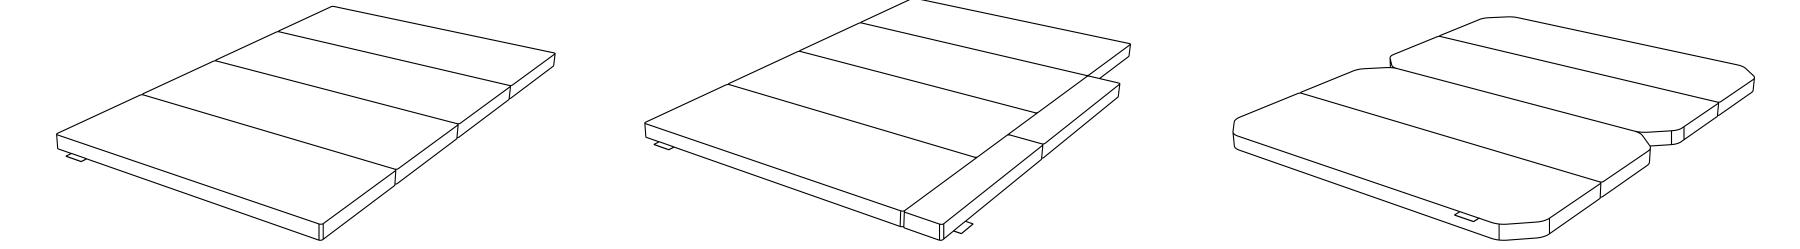 cama estructura700.jpg